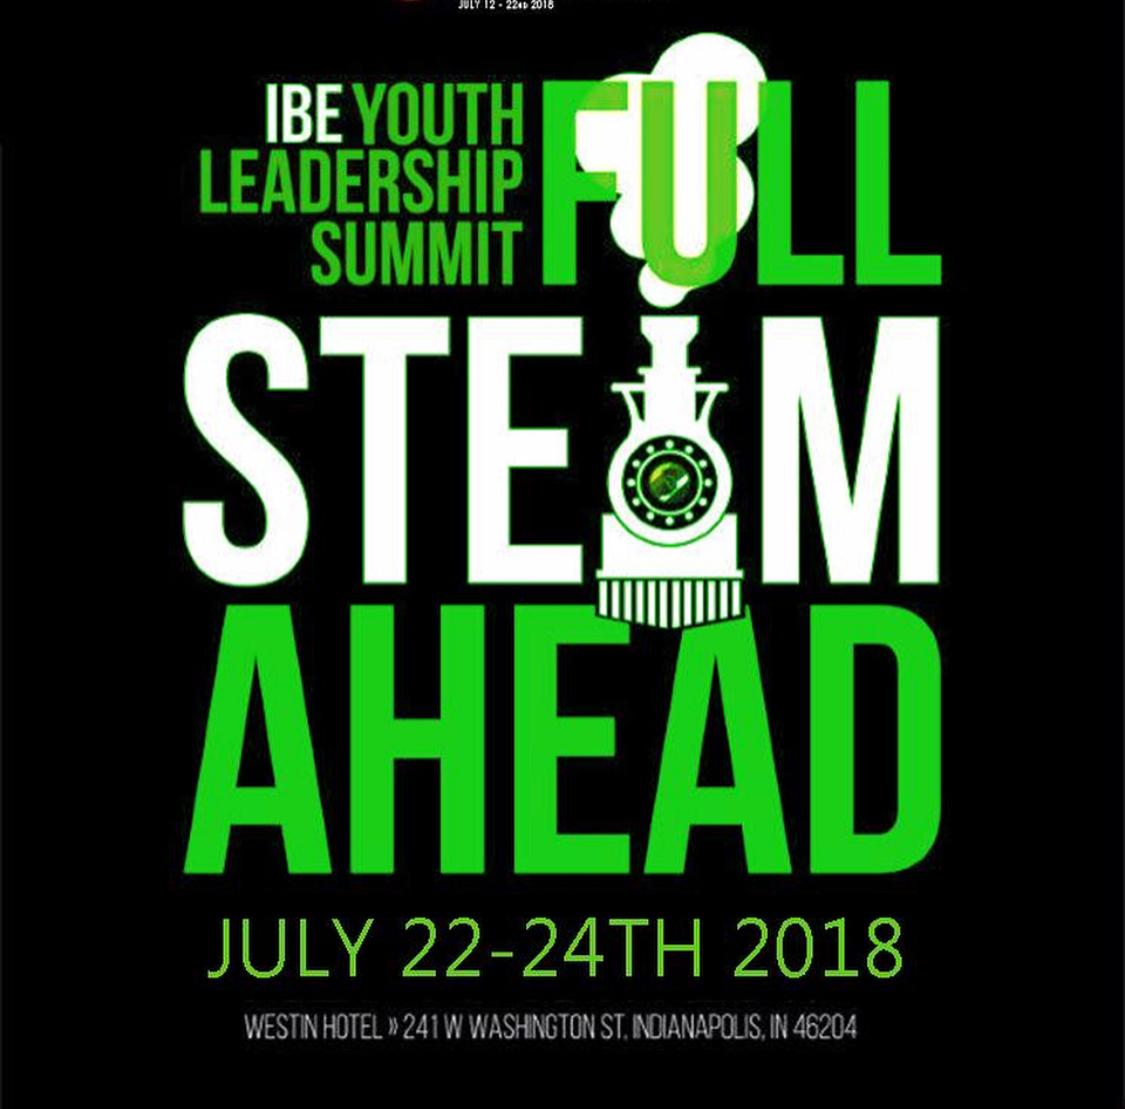 IBE Youth Leadership Summit Flyer